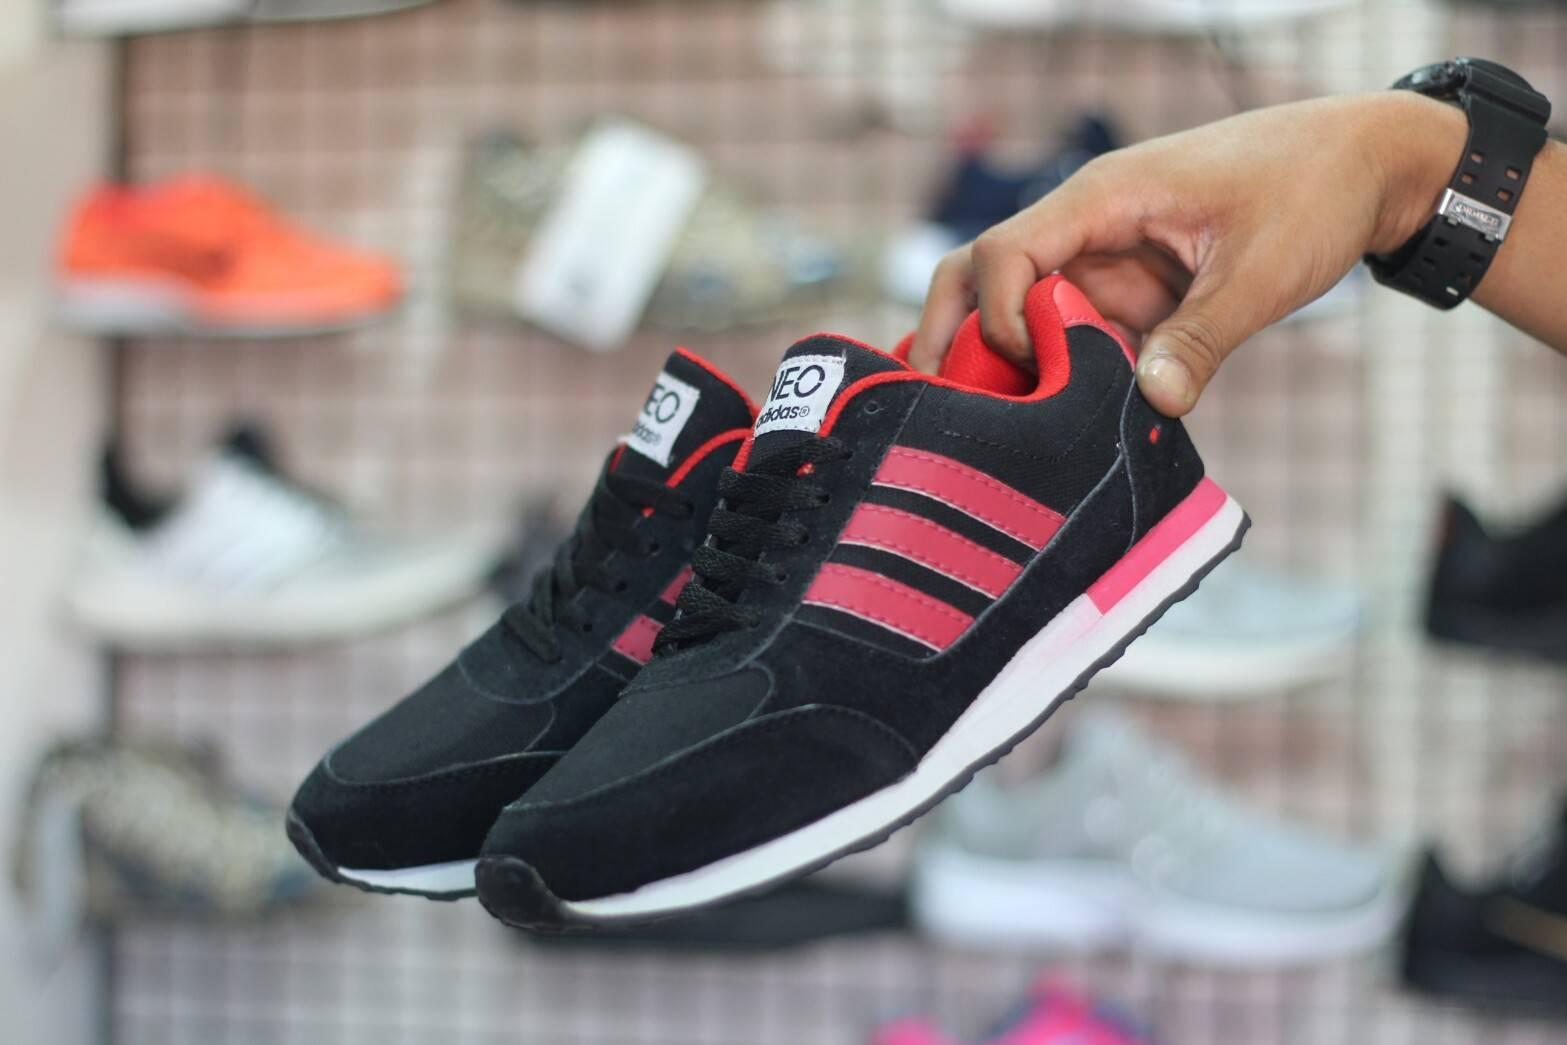 Sepatu Sport Pria Adidas NEO Racer Sneakers Olahraga / Running / Sport jogging casual sneakers nike adisdas boots sekolah anak formal kets